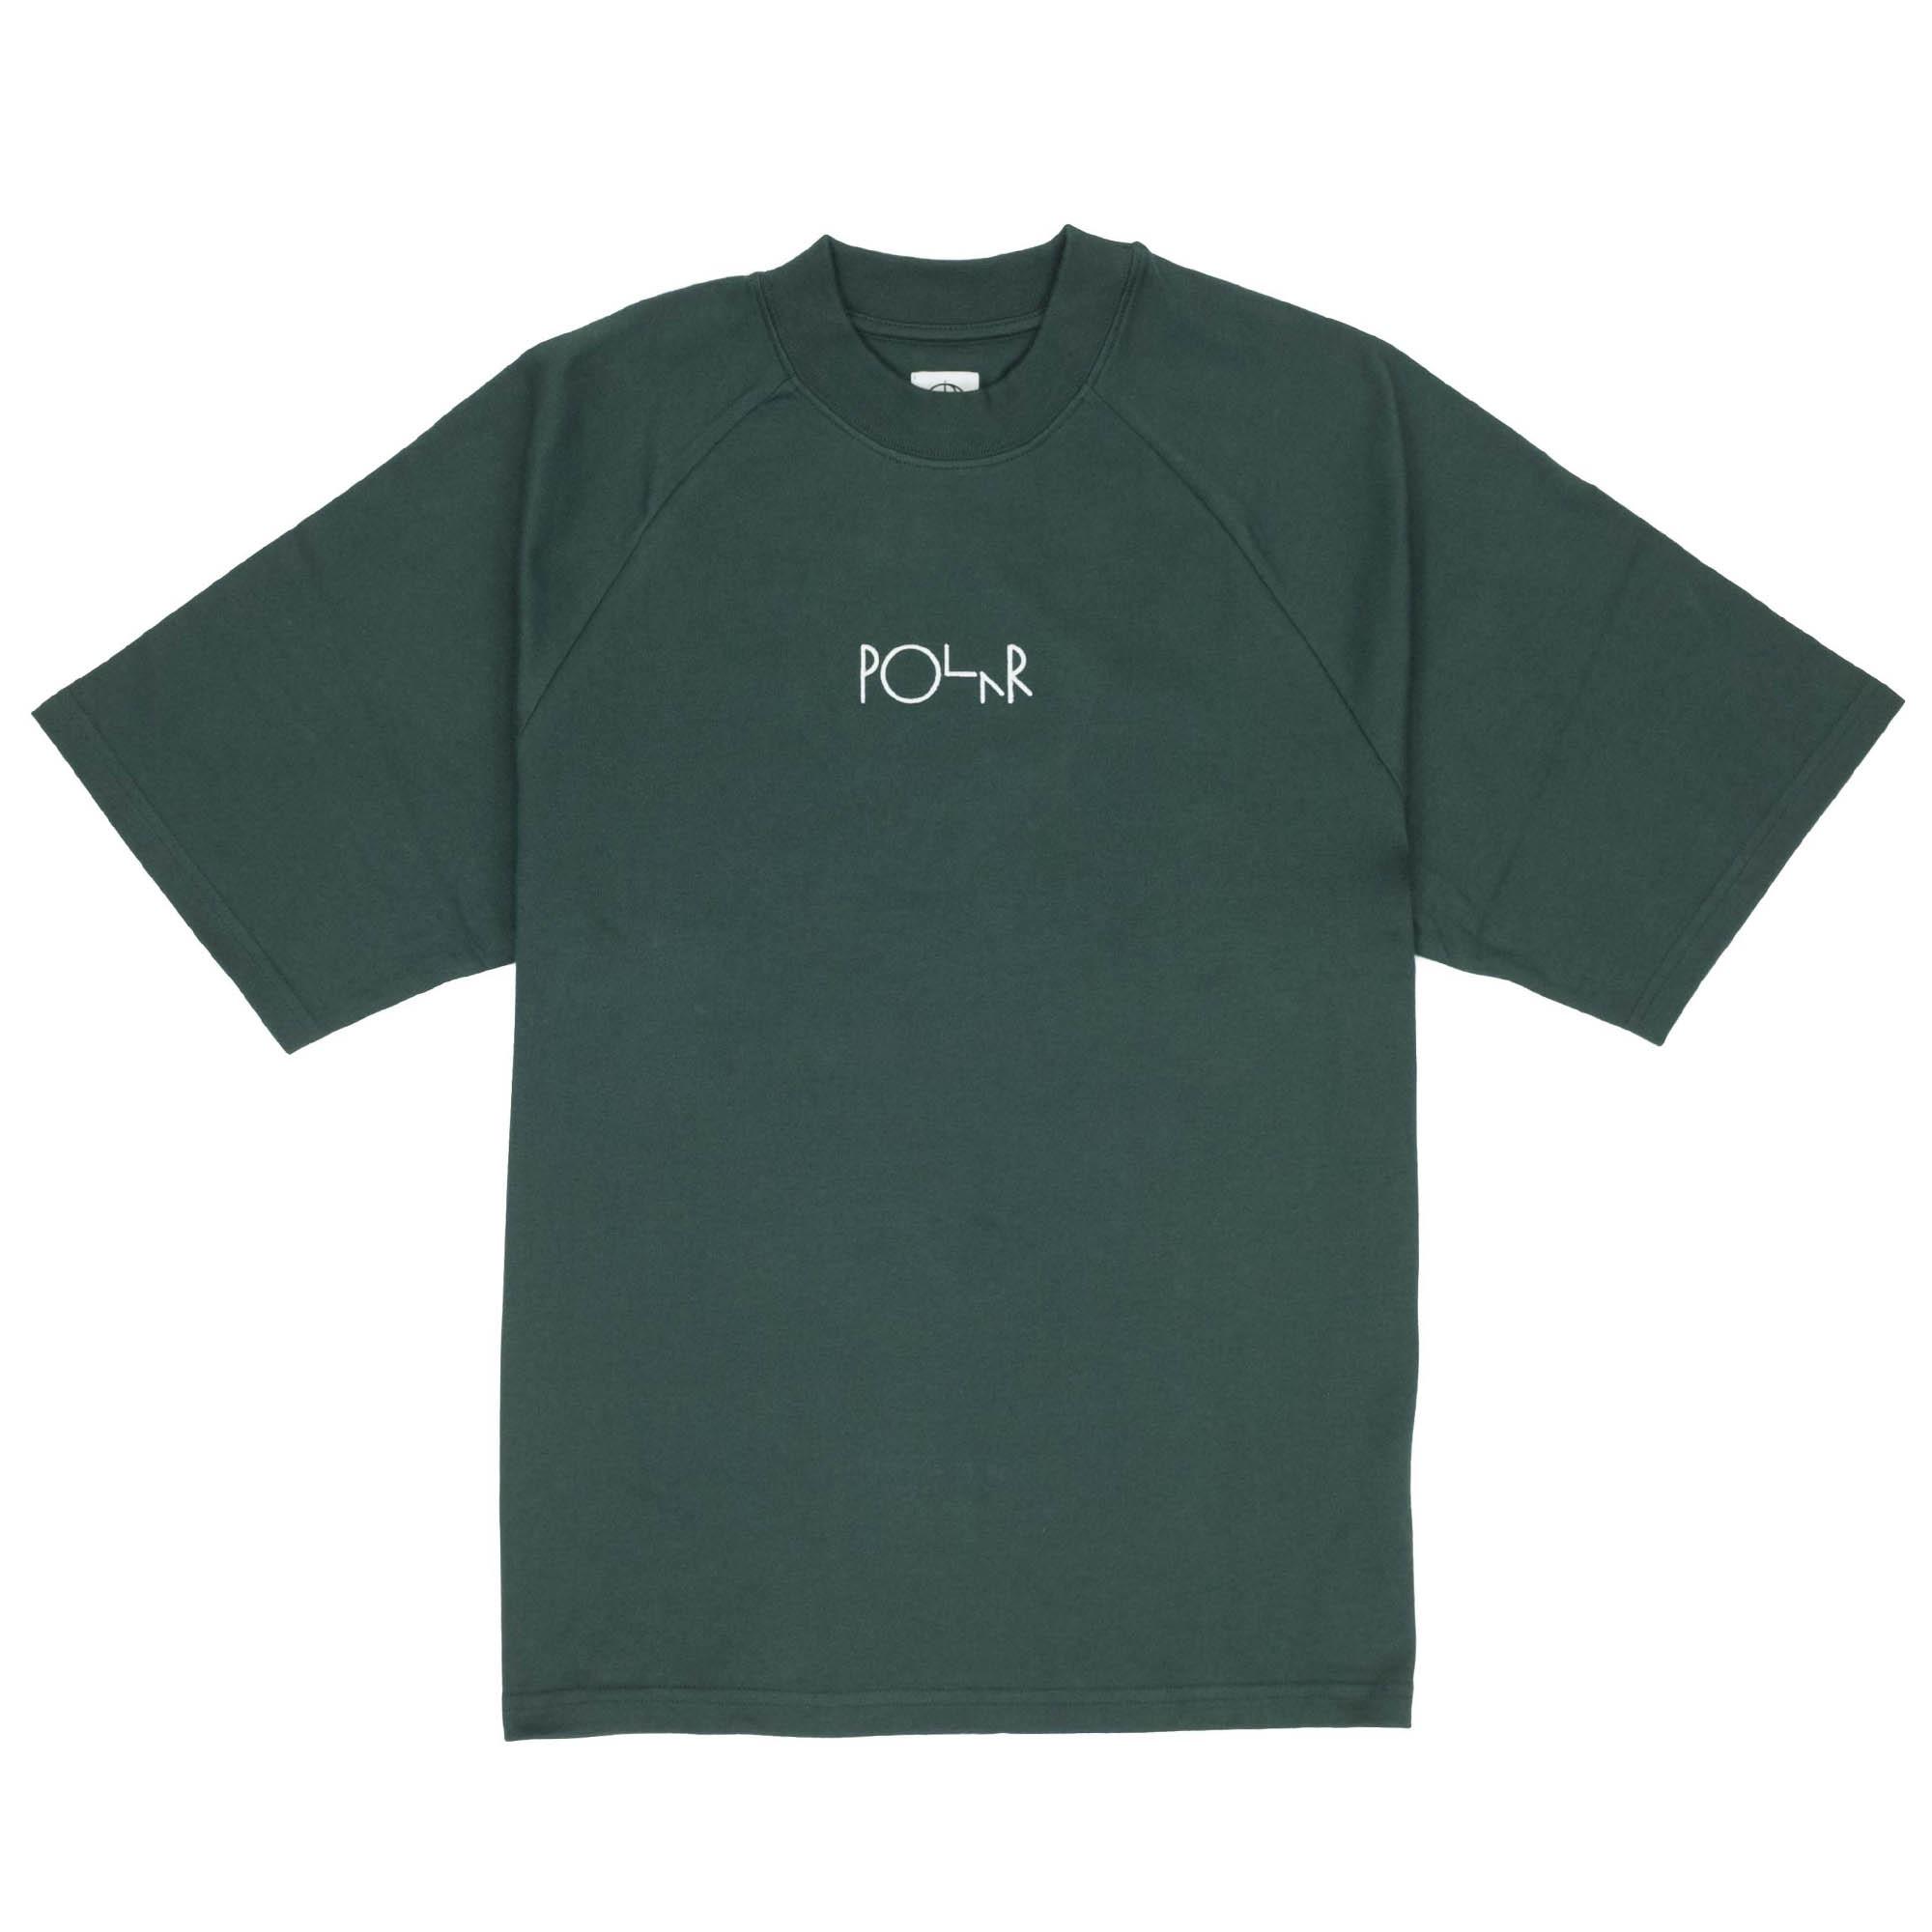 Polar Skate Co. Default T Shirt - Green